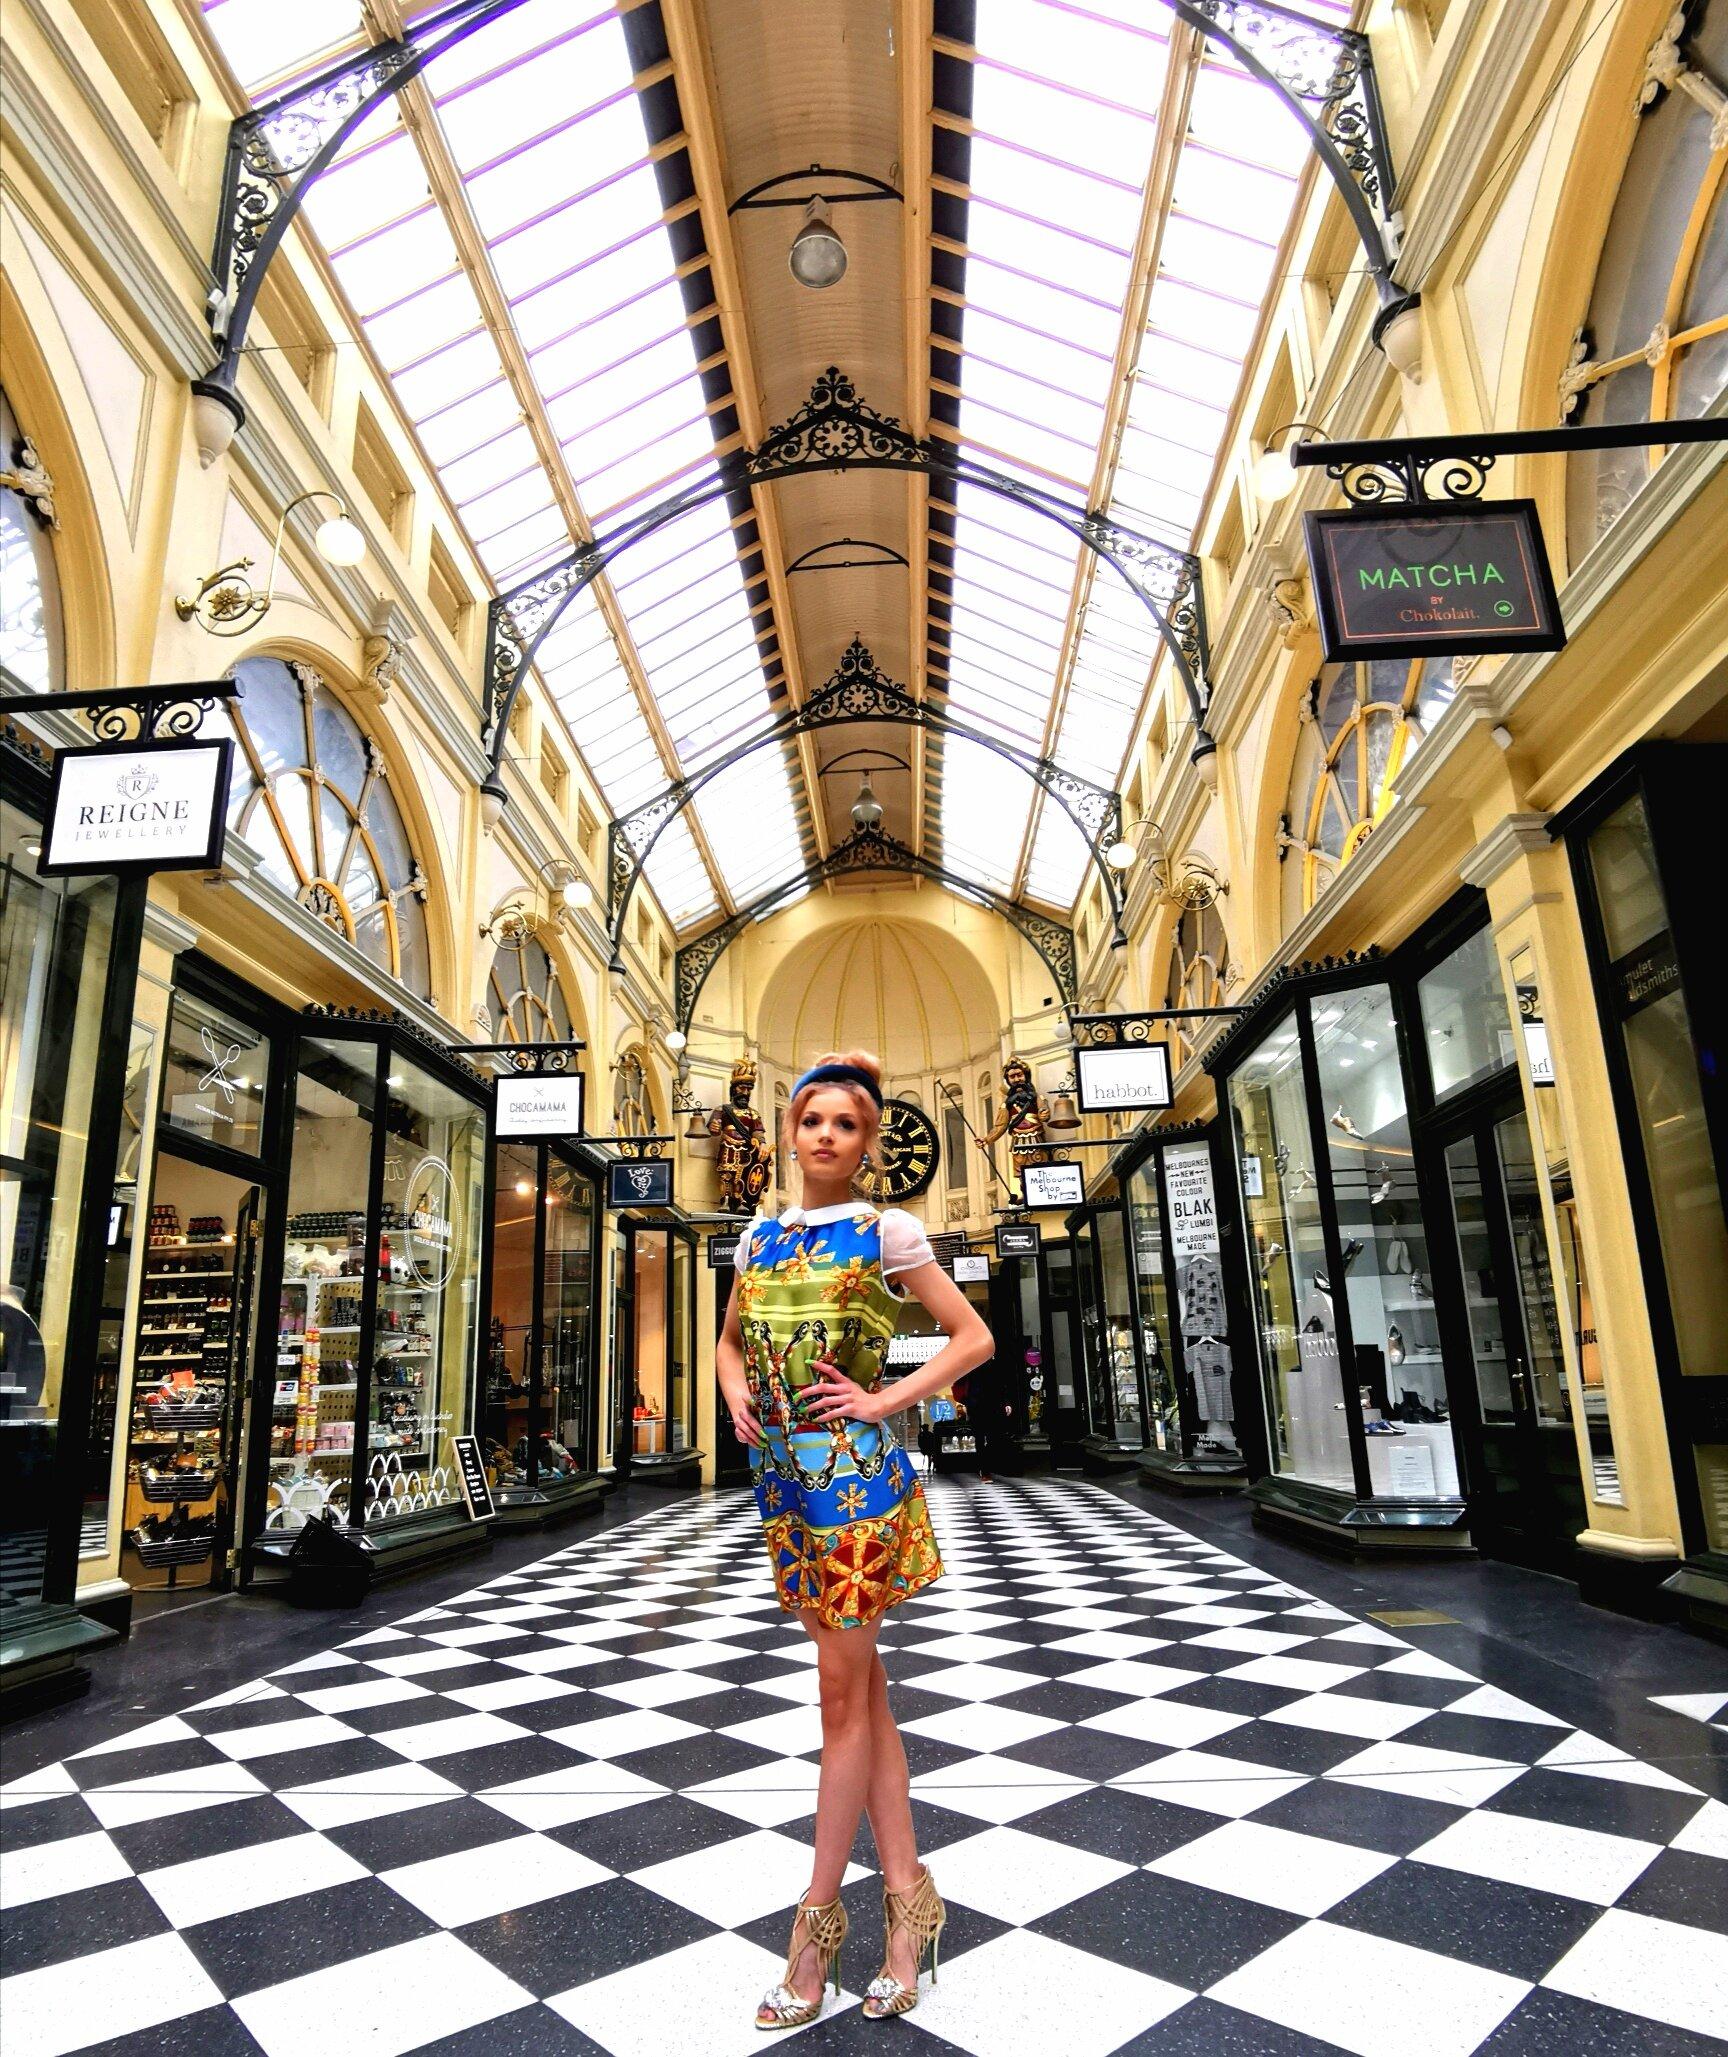 carla royal arcade.jpg